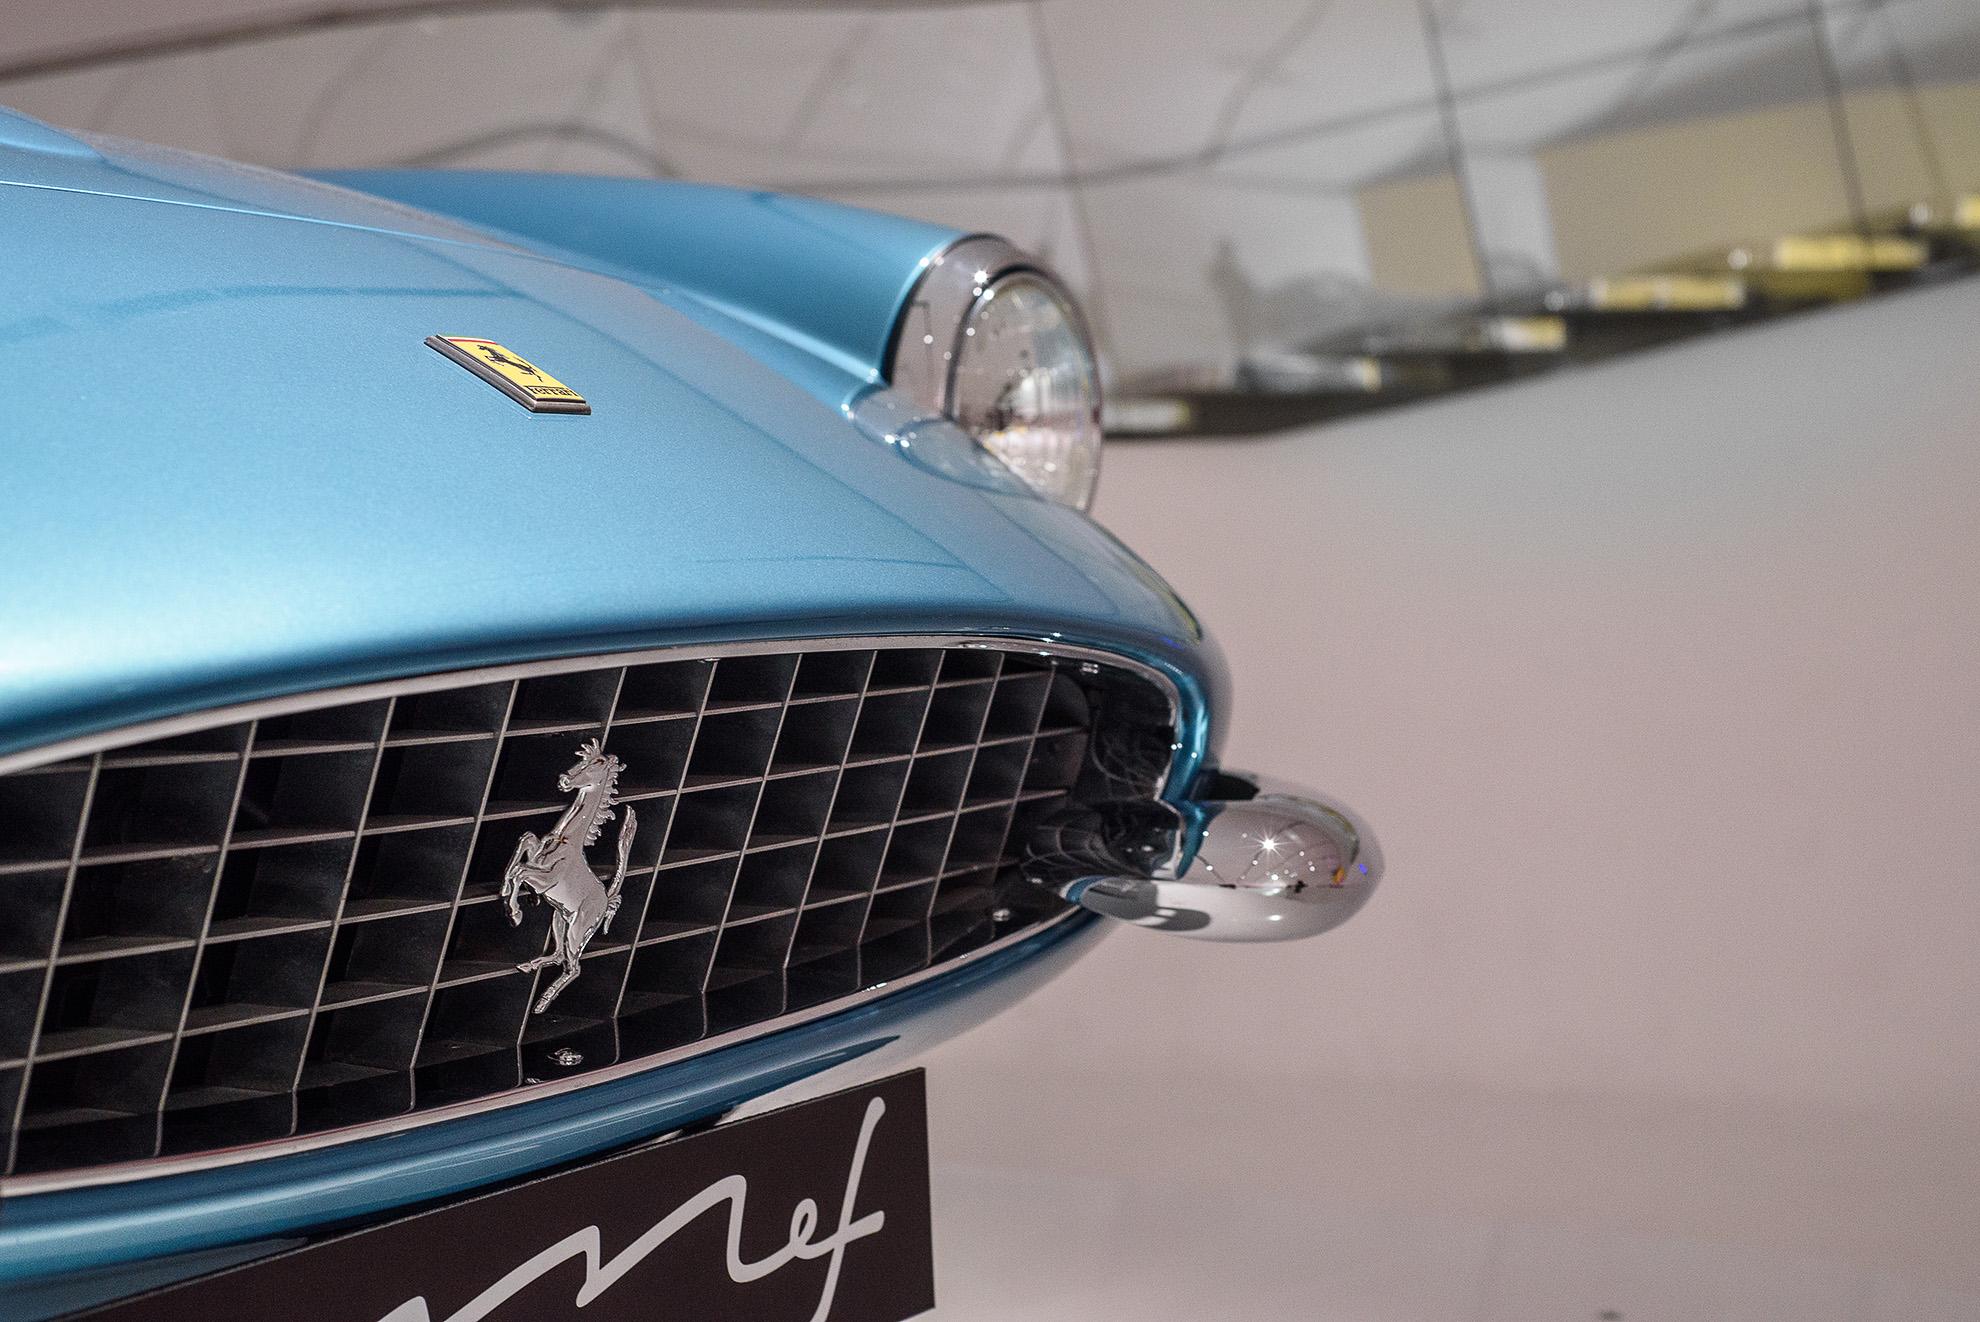 Muse Enzo Ferrrari - Ferrari 500 Super Fast